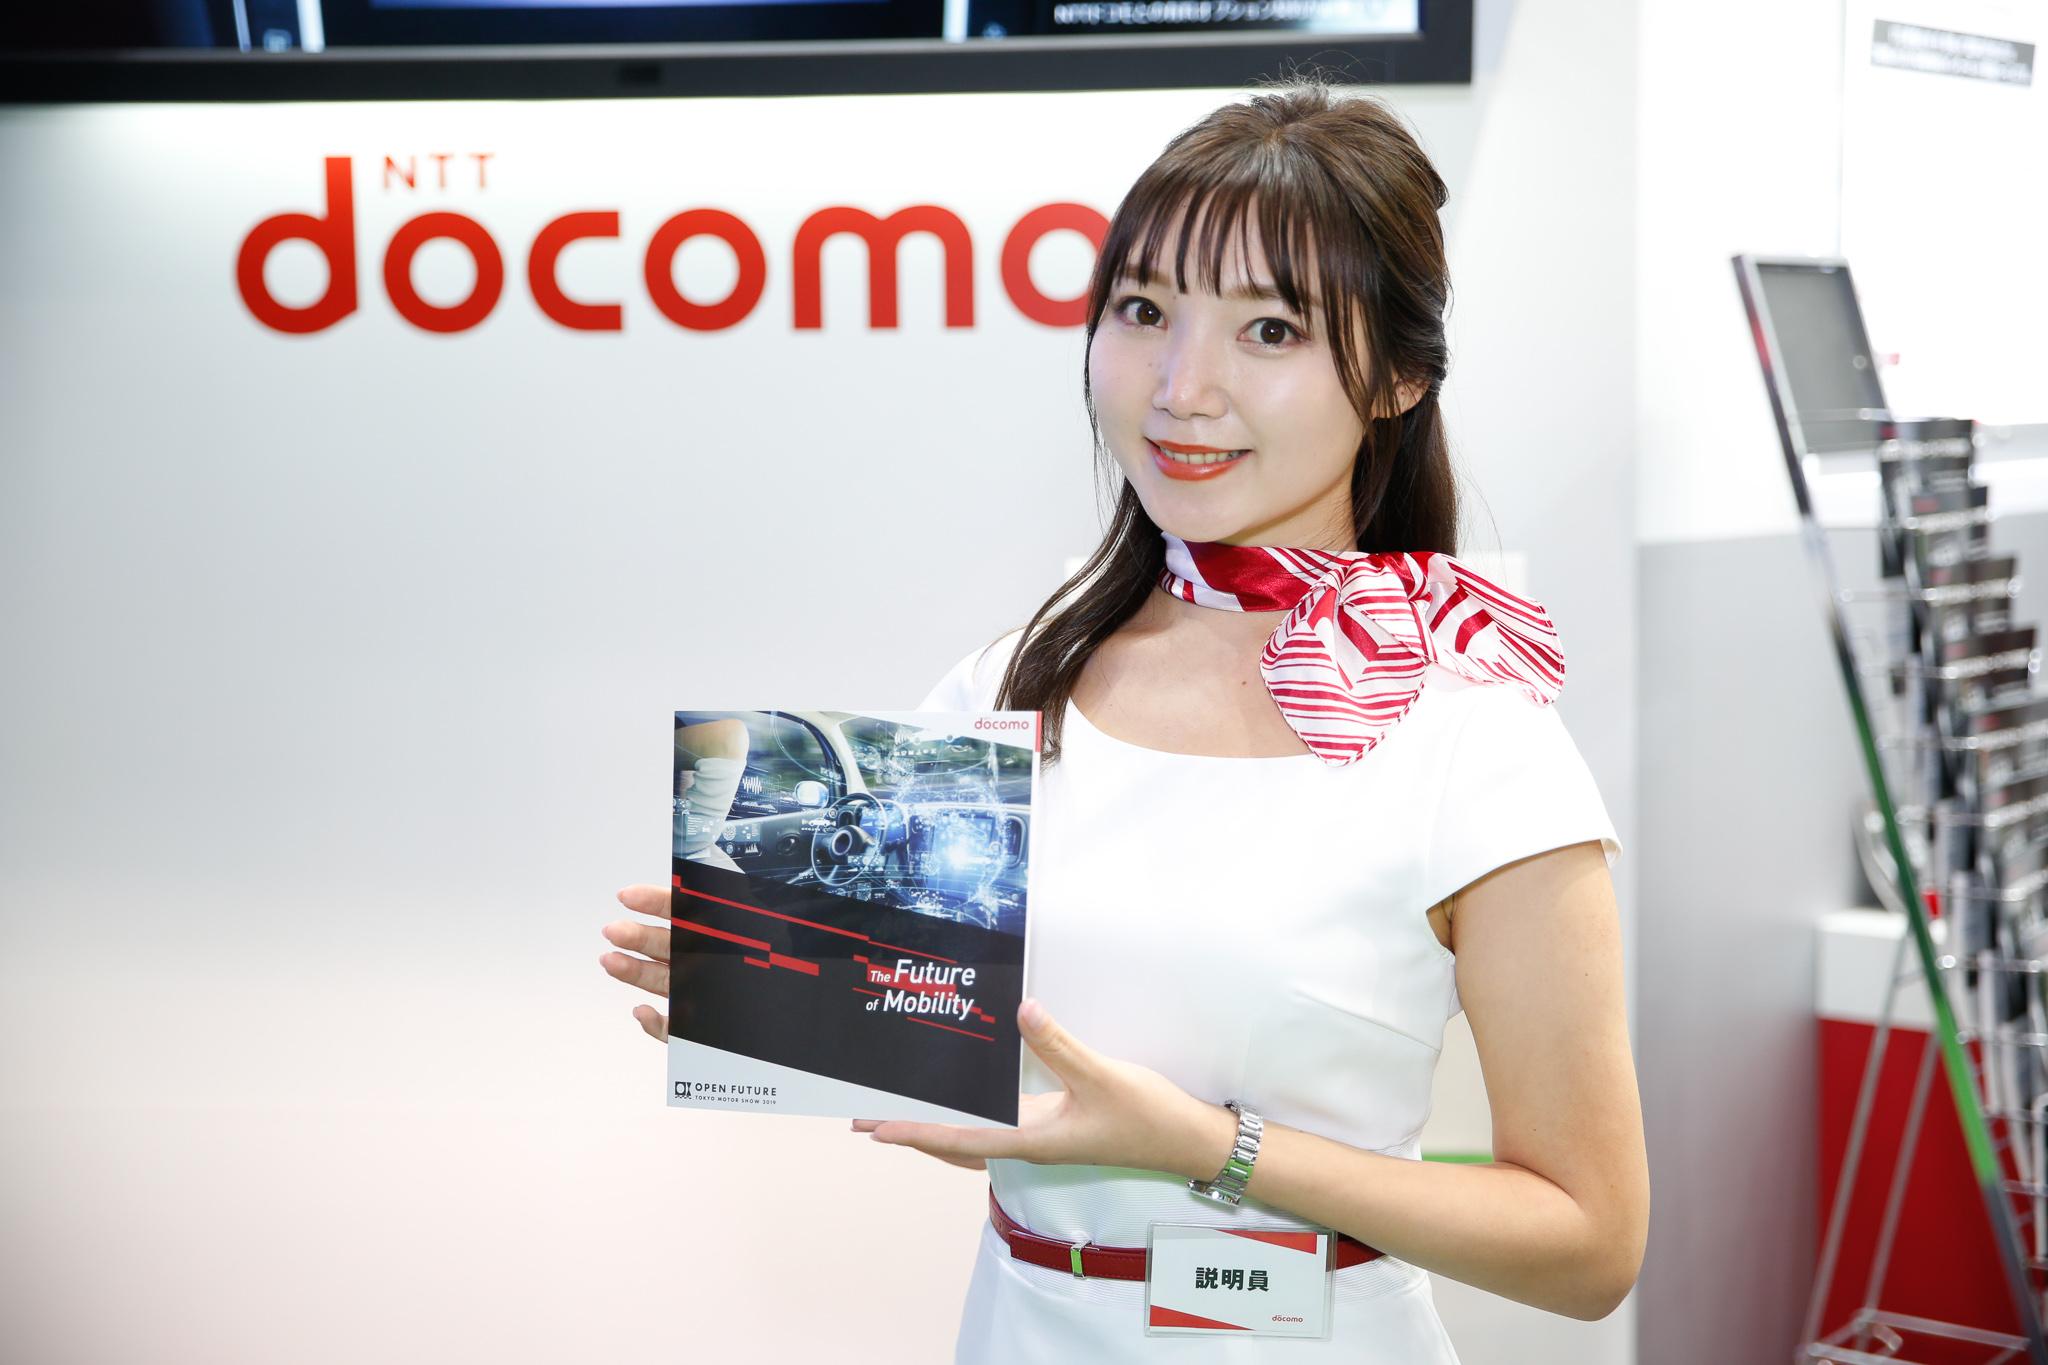 docomo 東京モーターショー2019 コンパニオン